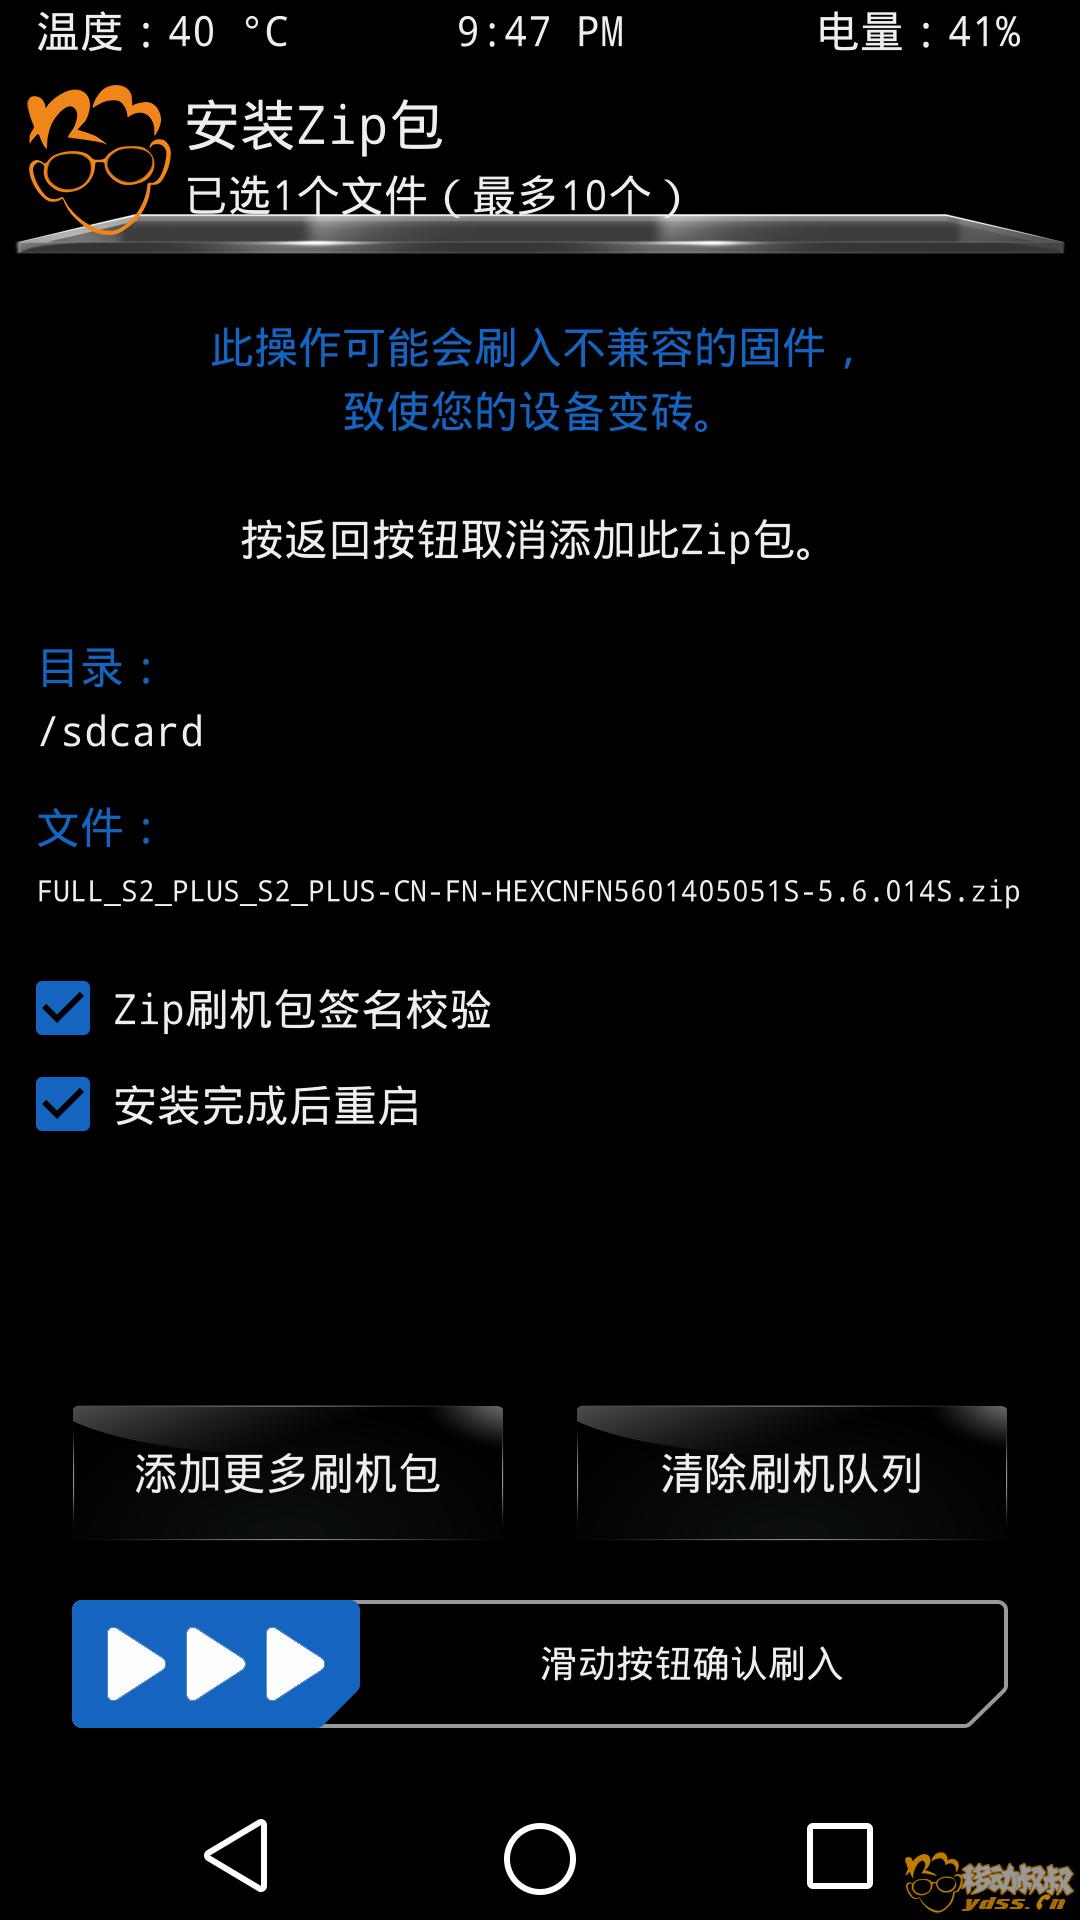 Screenshot_2016-05-13-21-47-48.png